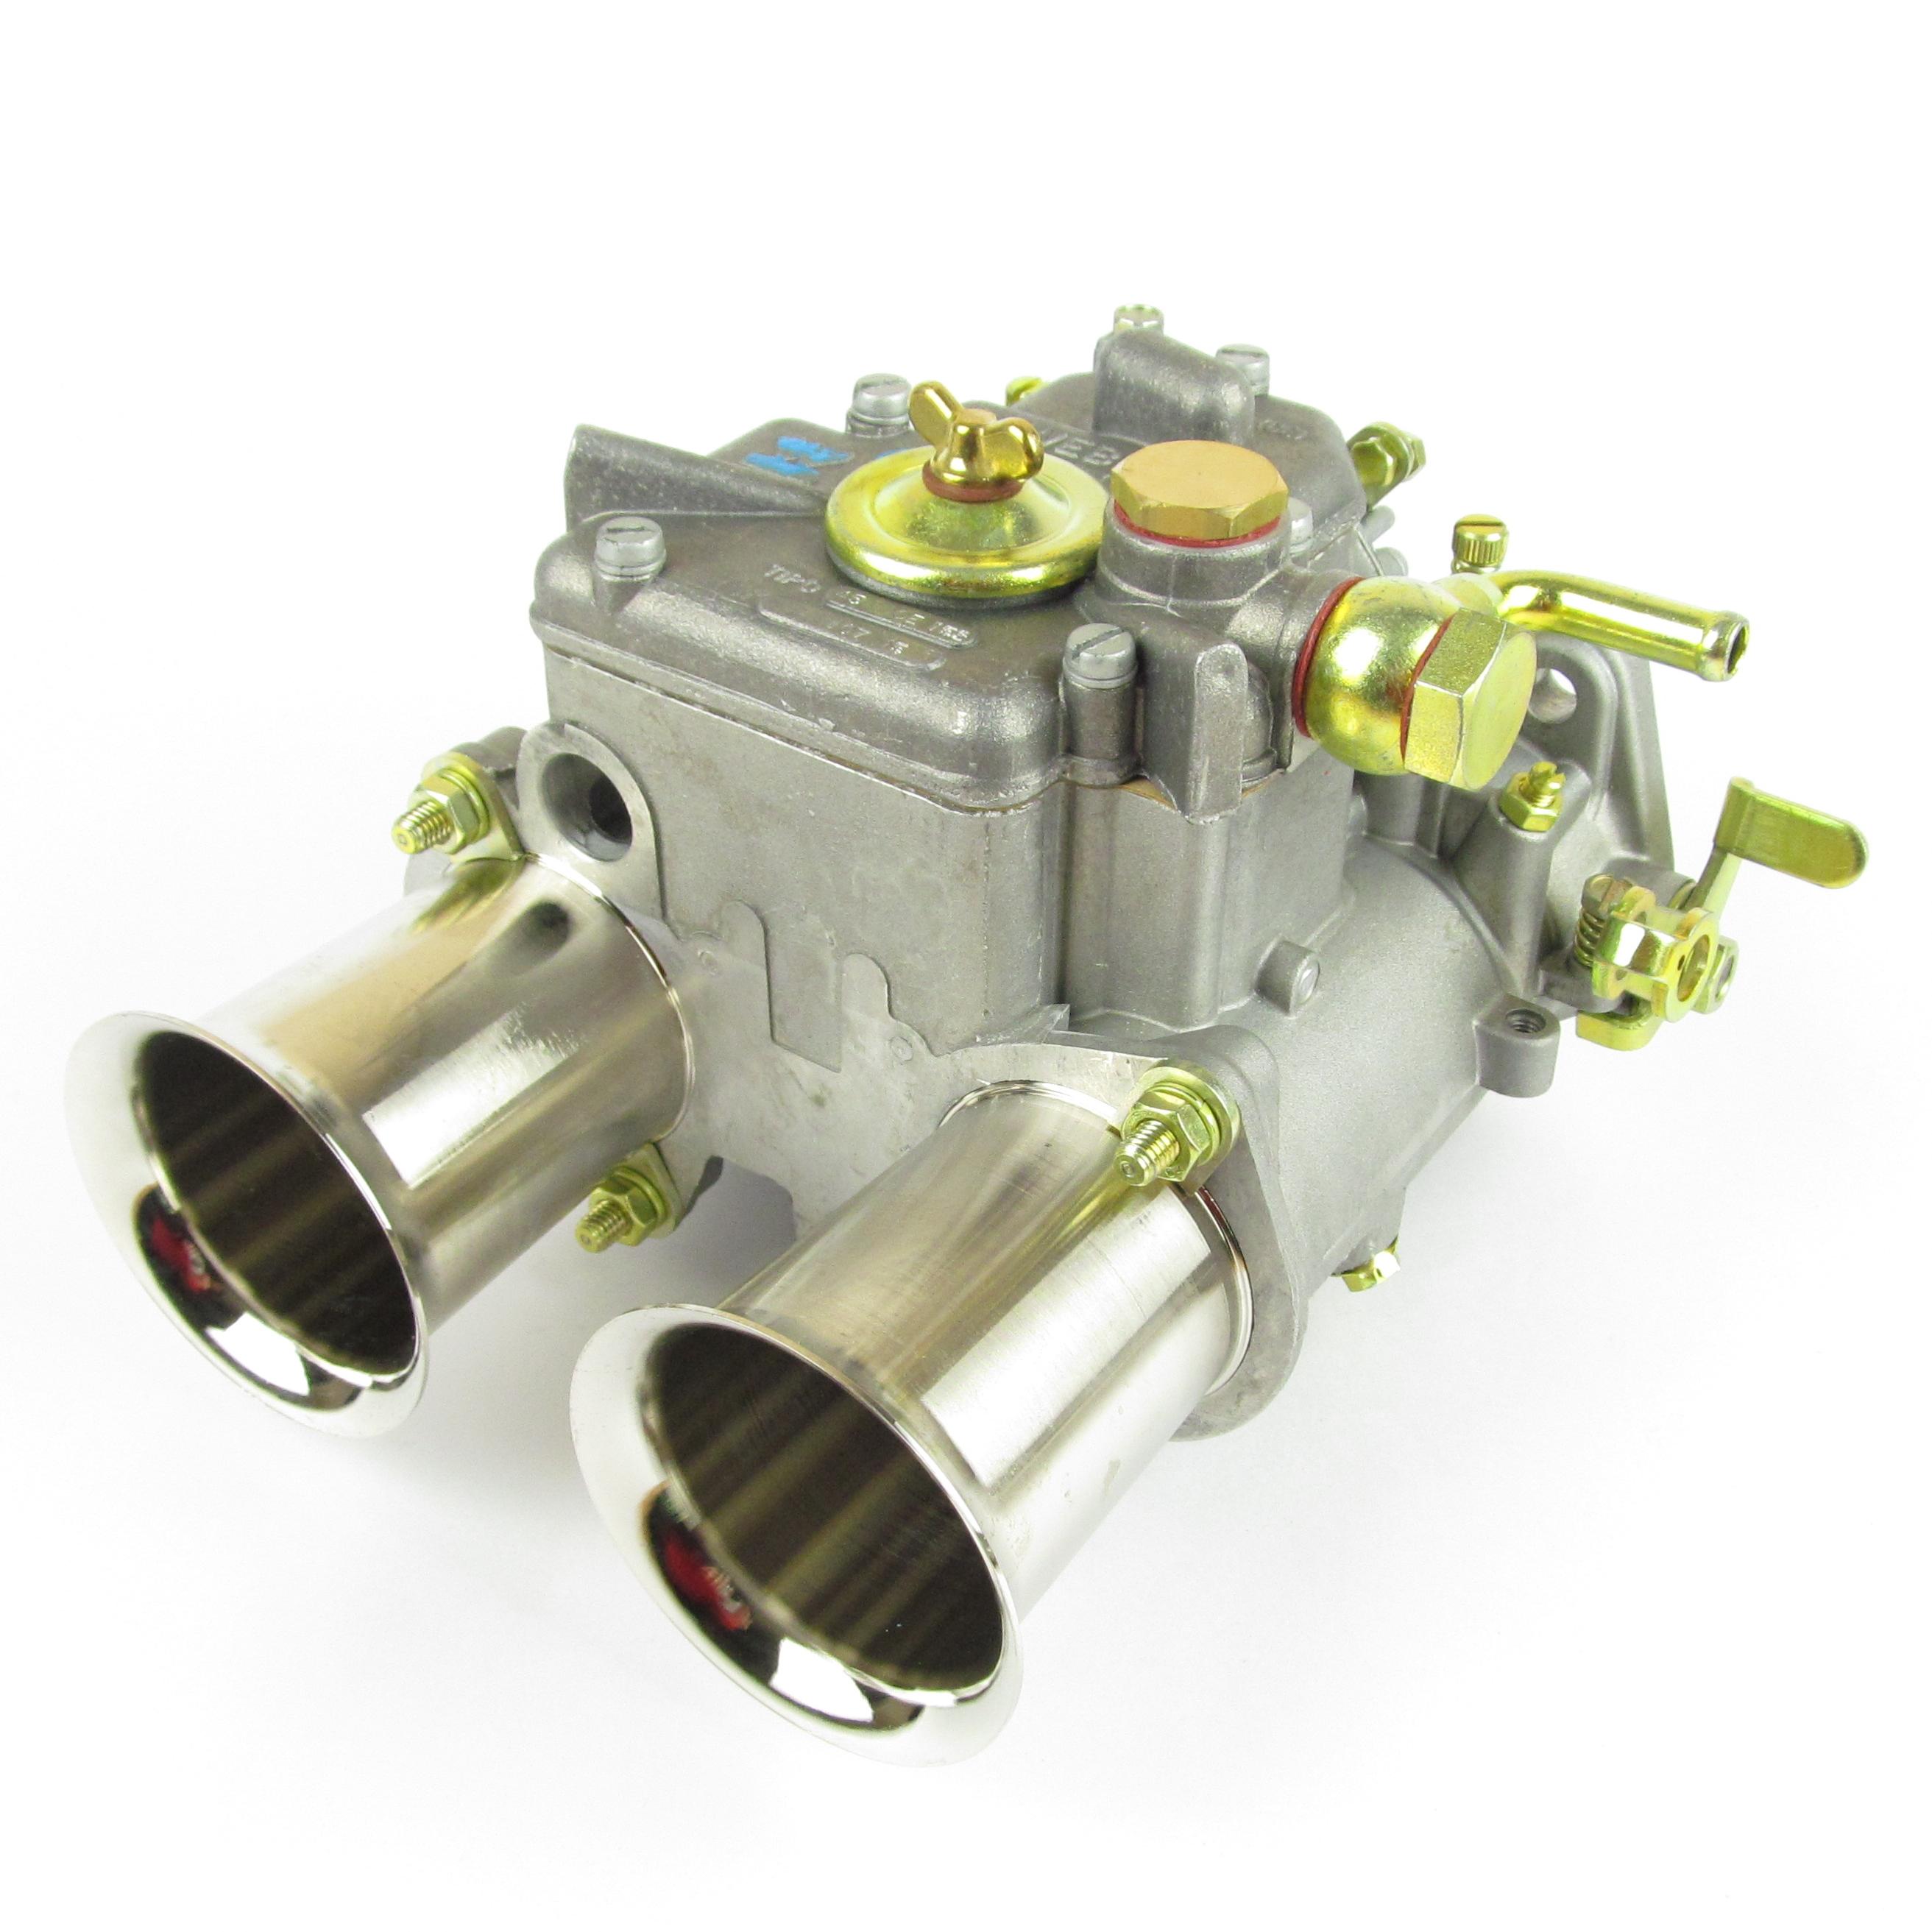 19600 060 weber dcoe 45 carburettor 152